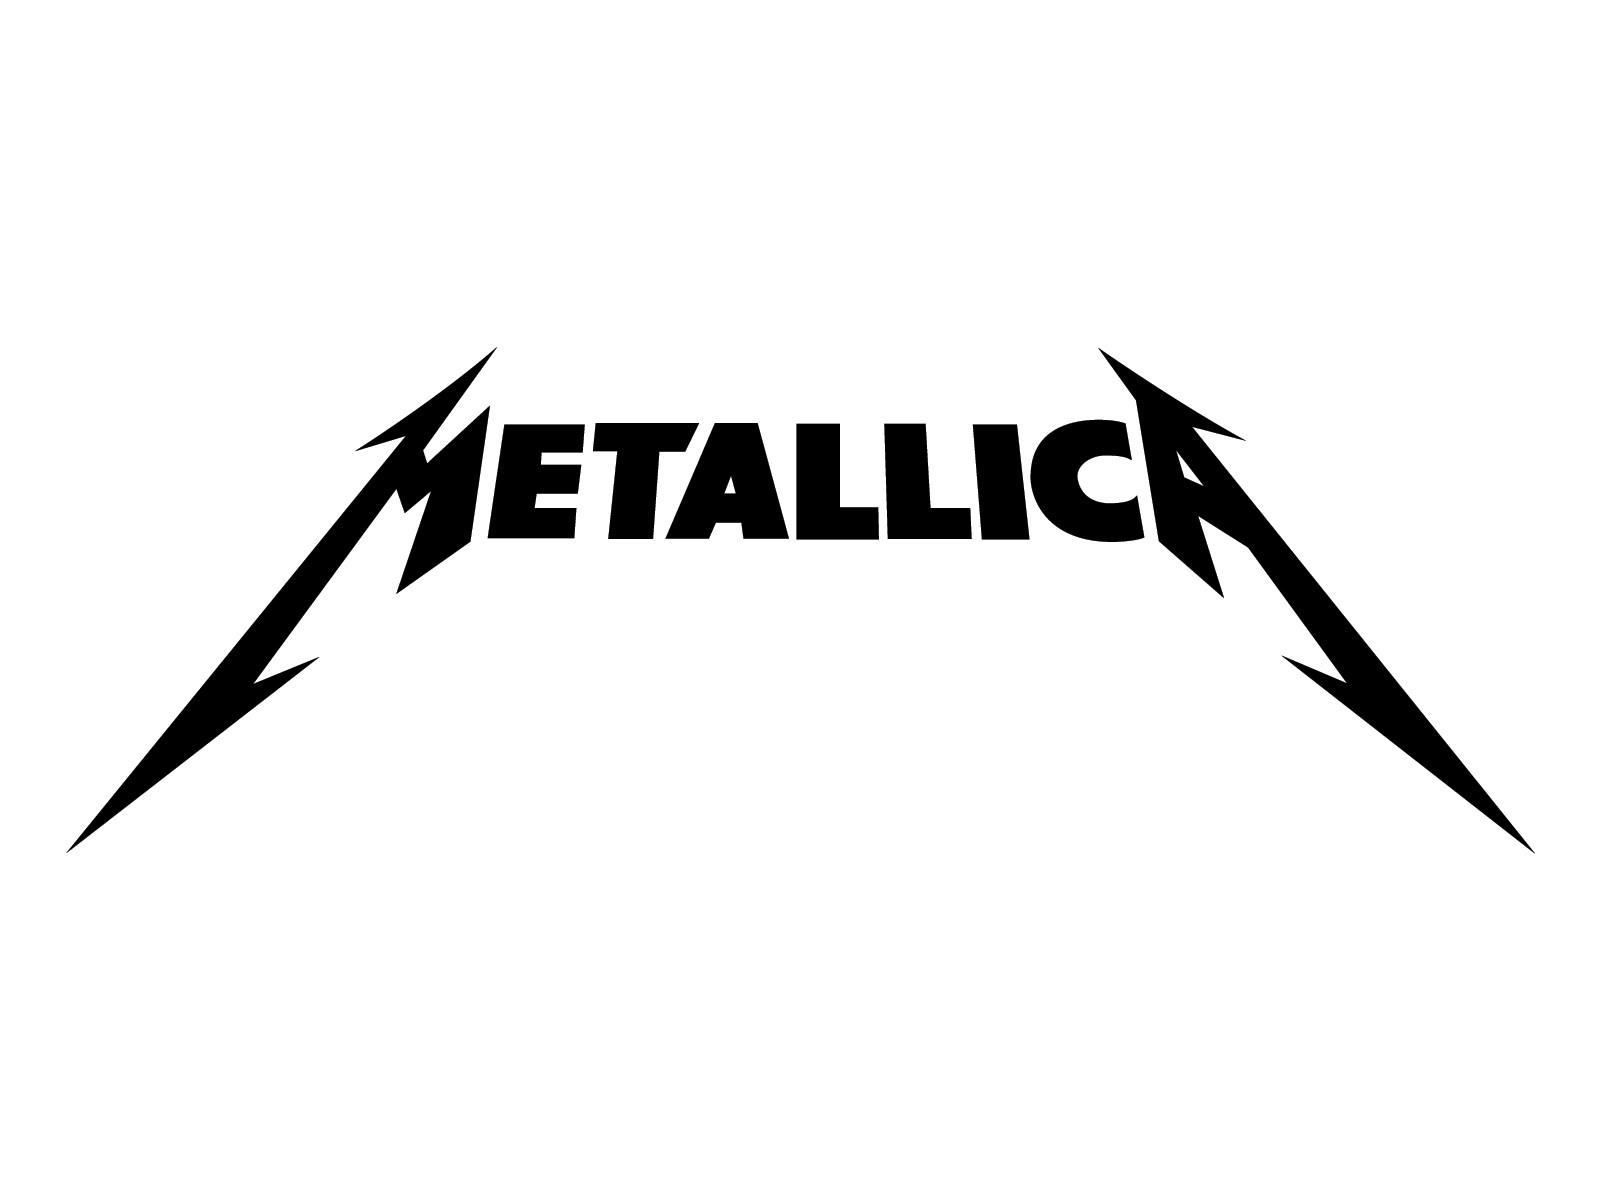 General 1600x1200 Metallica  heavy metal thrash metal music logo band logo Big 4  minimalism